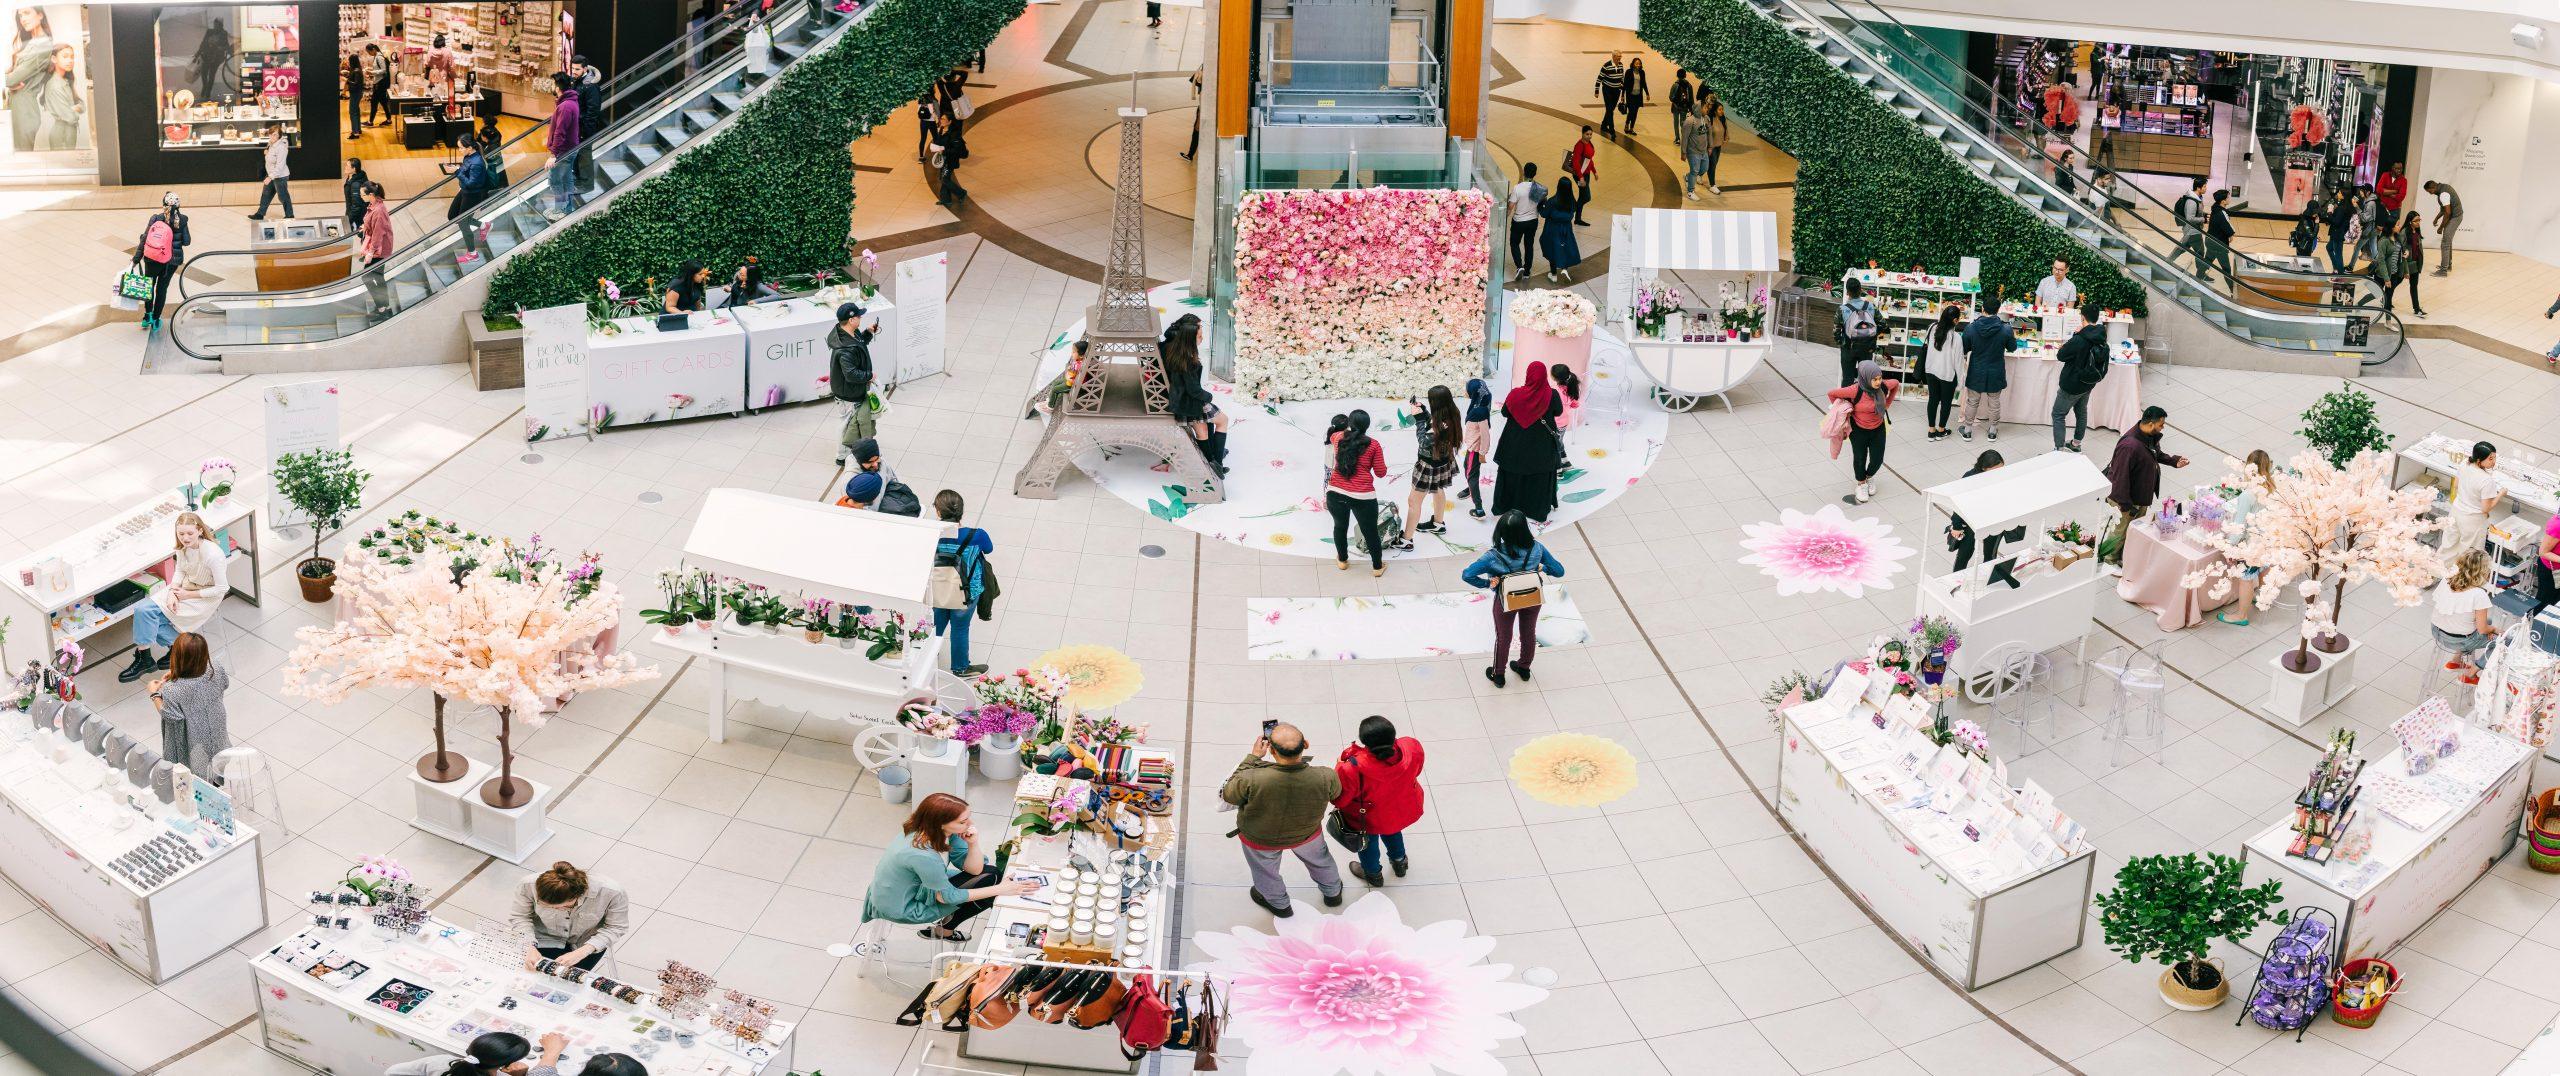 STC Court space Flower Market